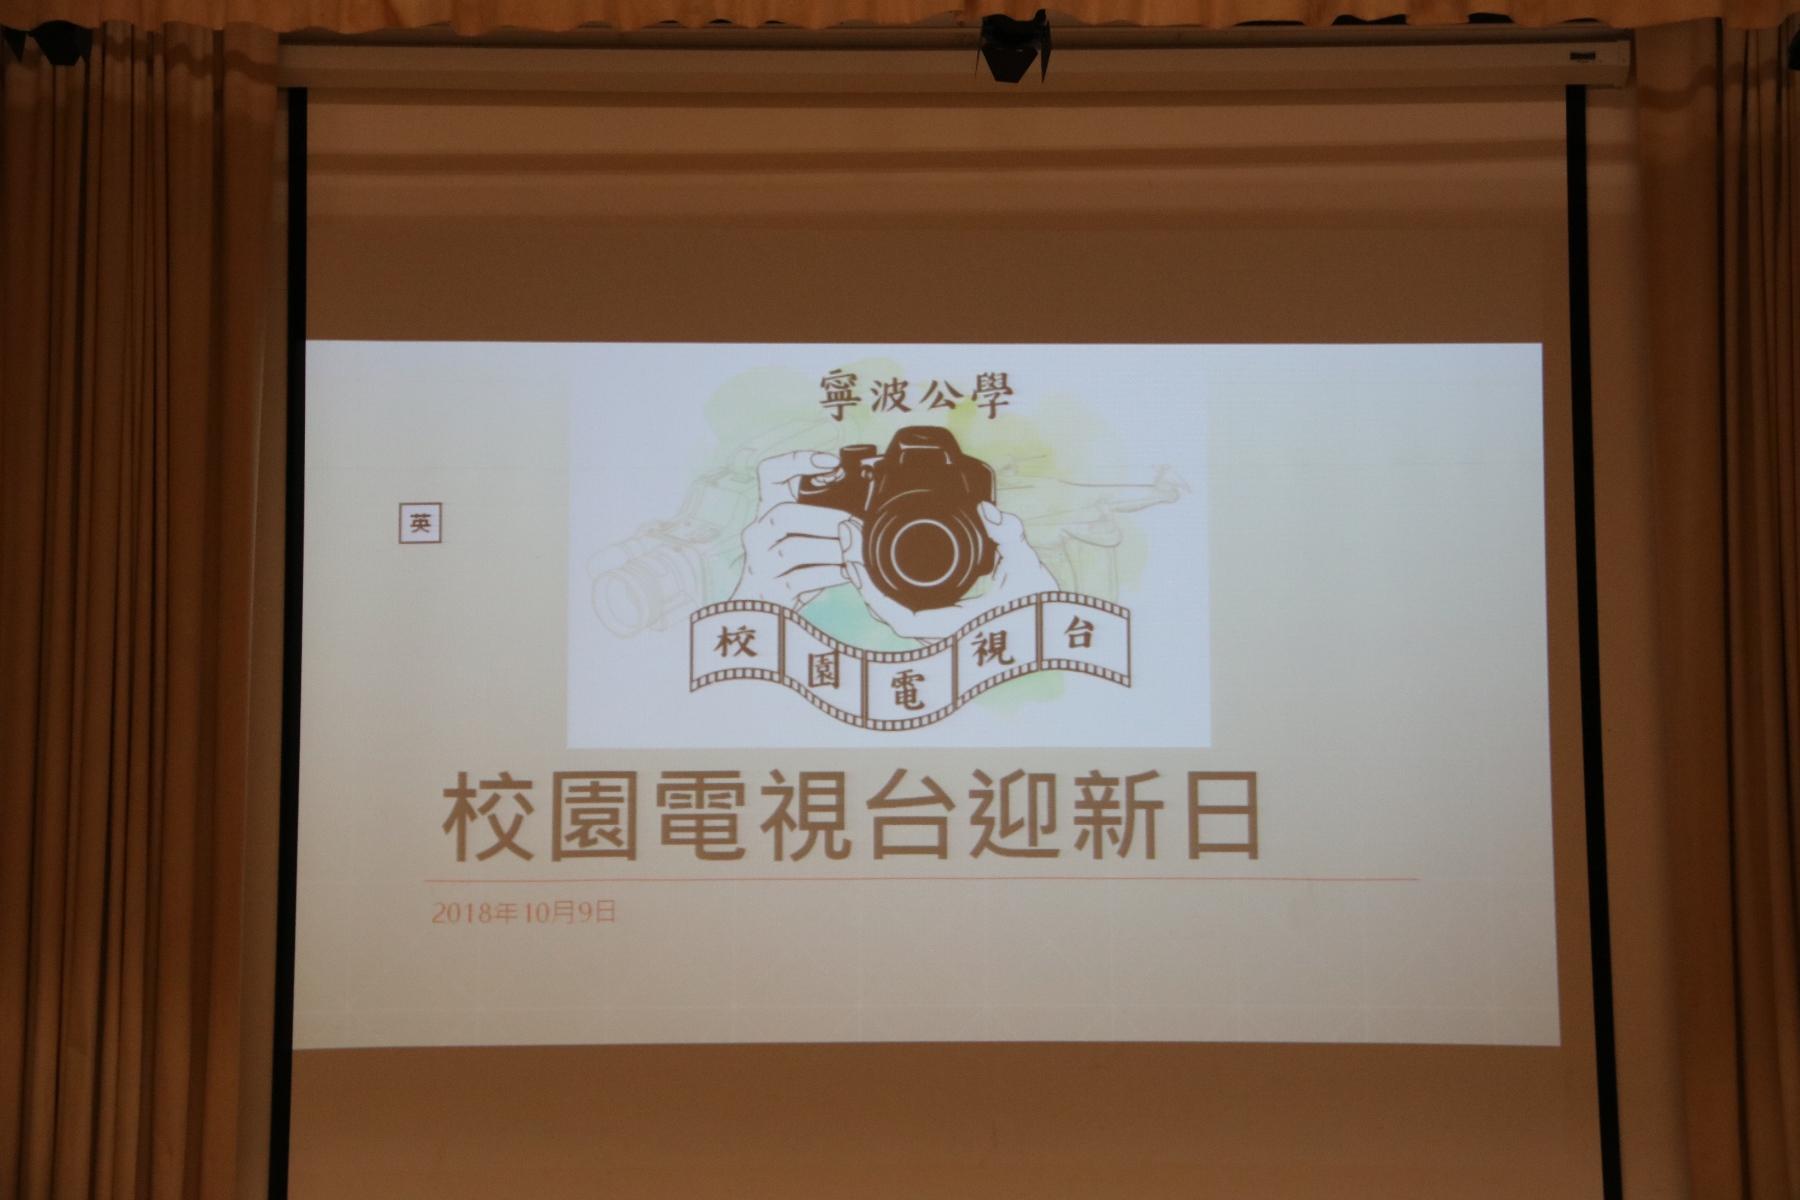 http://npc.edu.hk/sites/default/files/img_9125.jpg